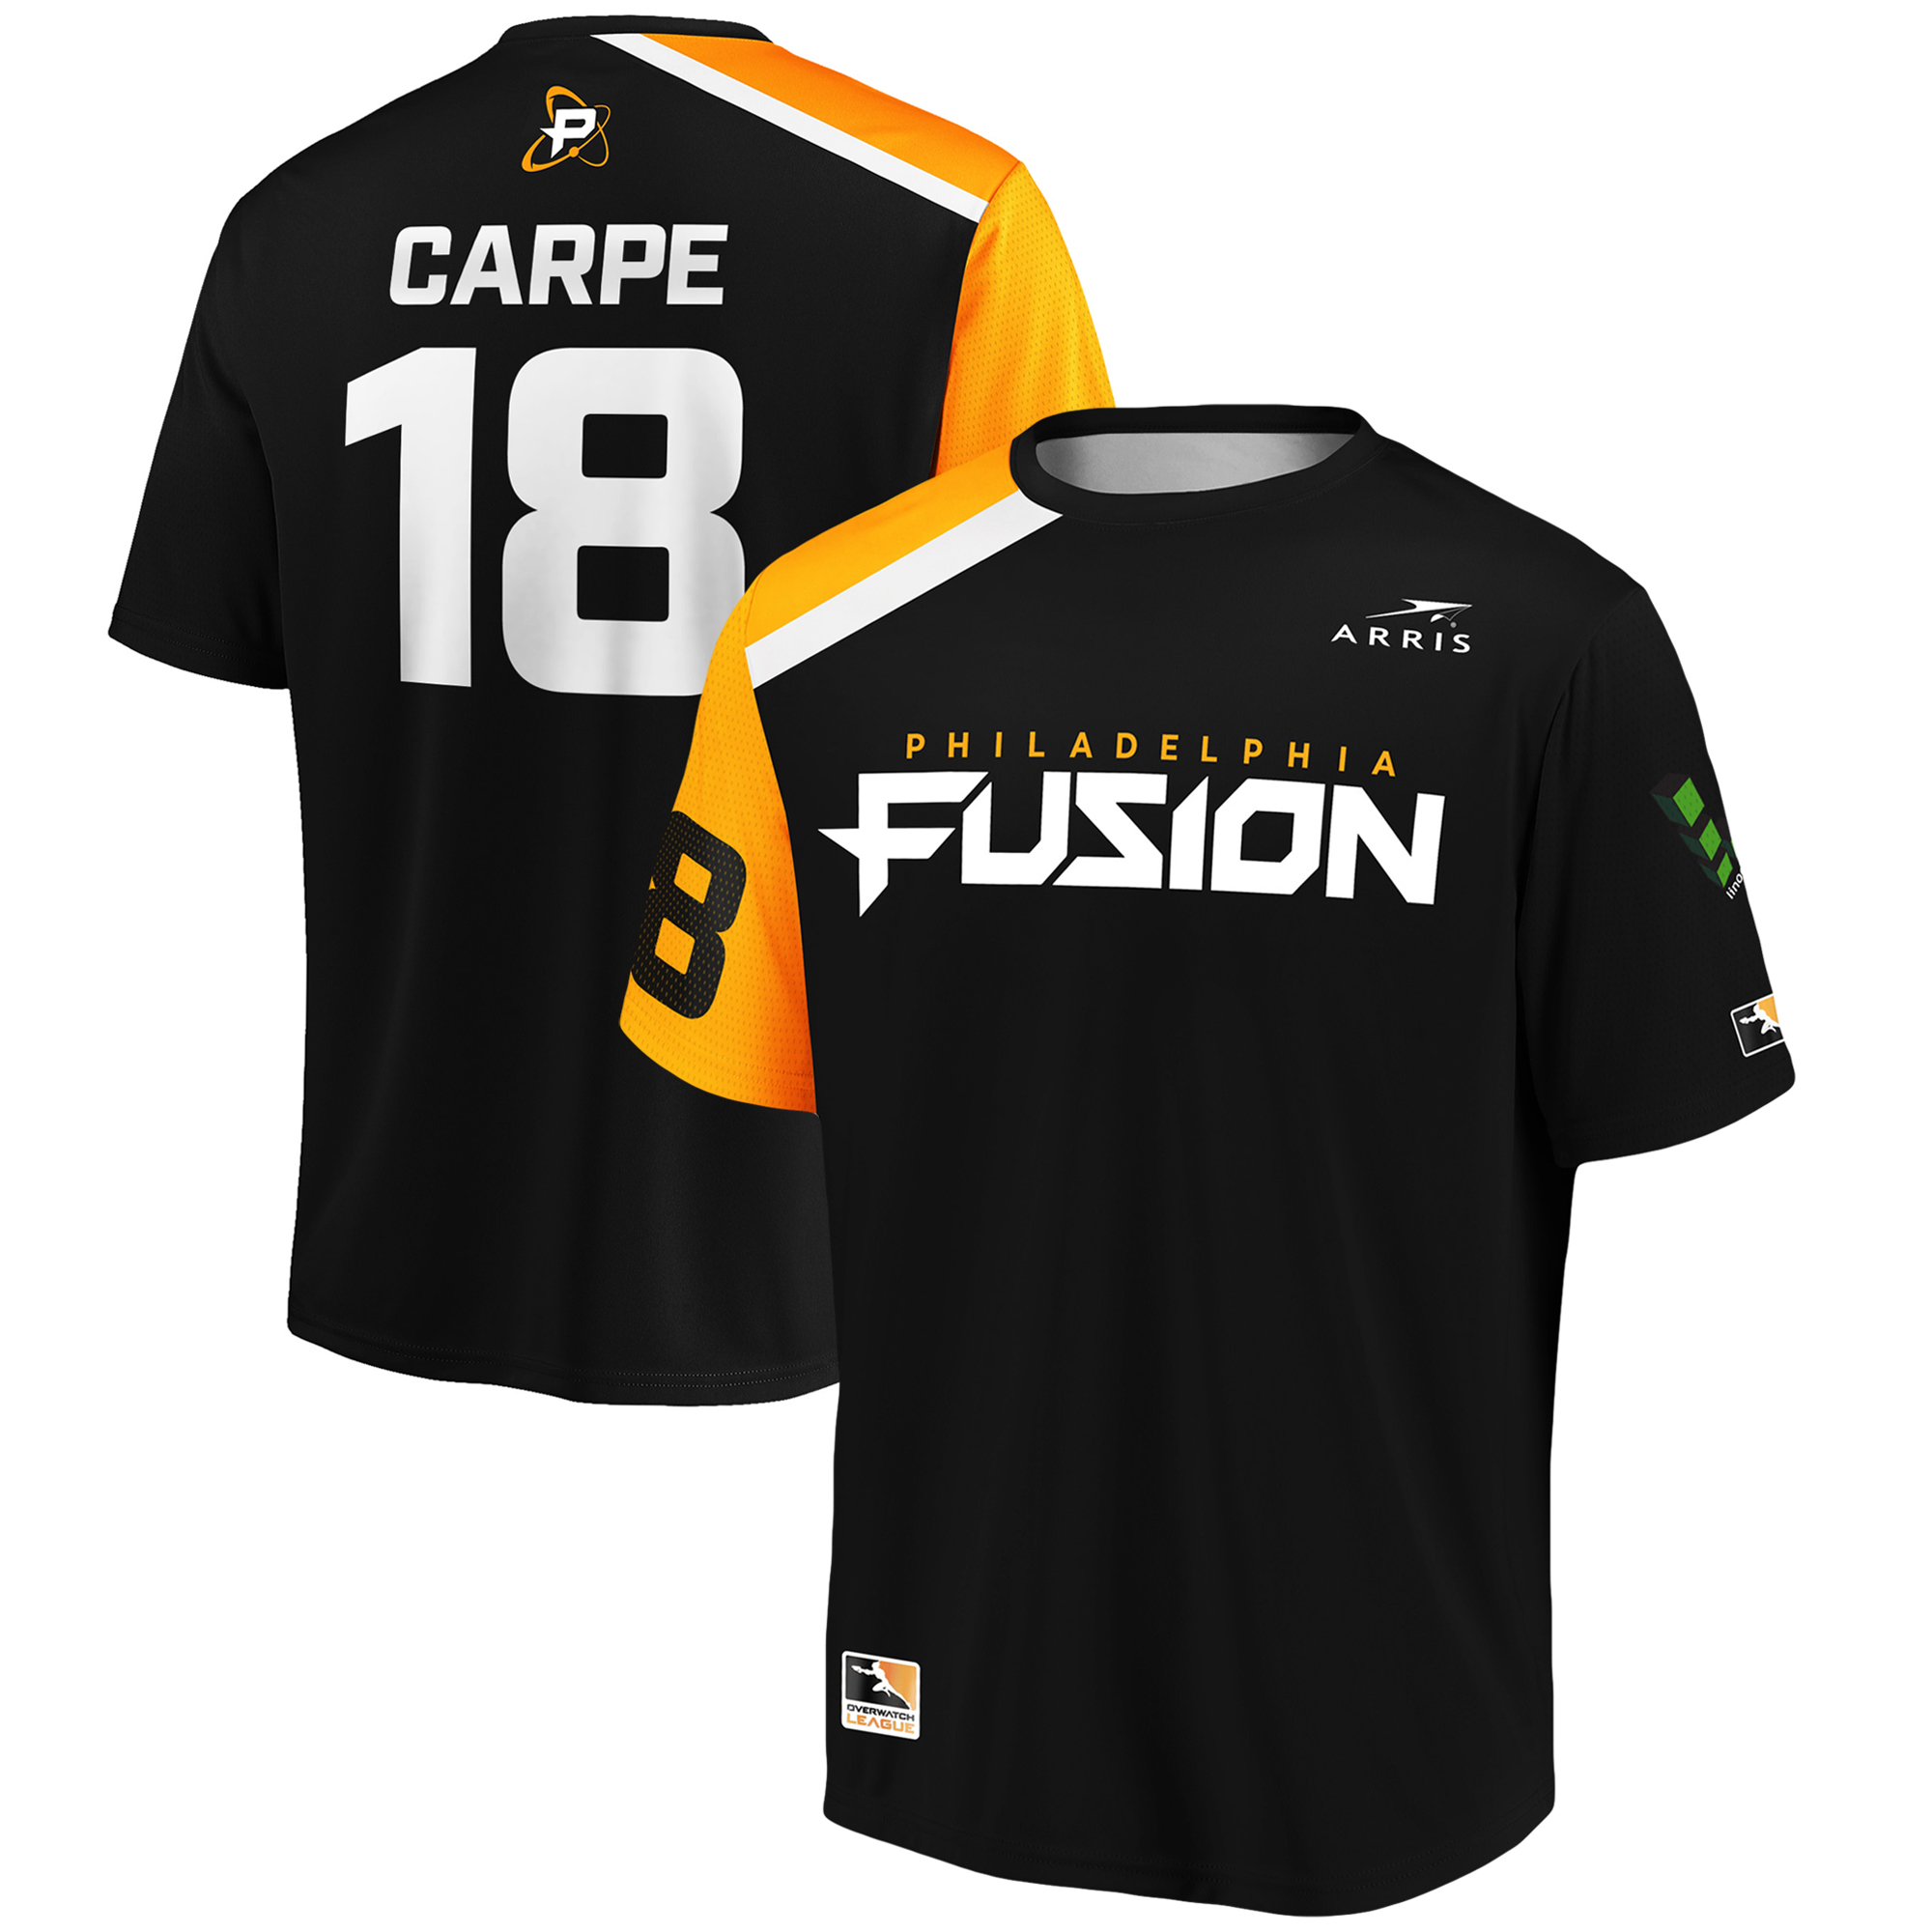 carpe Philadelphia Fusion Overwatch League Replica Home Jersey - Black